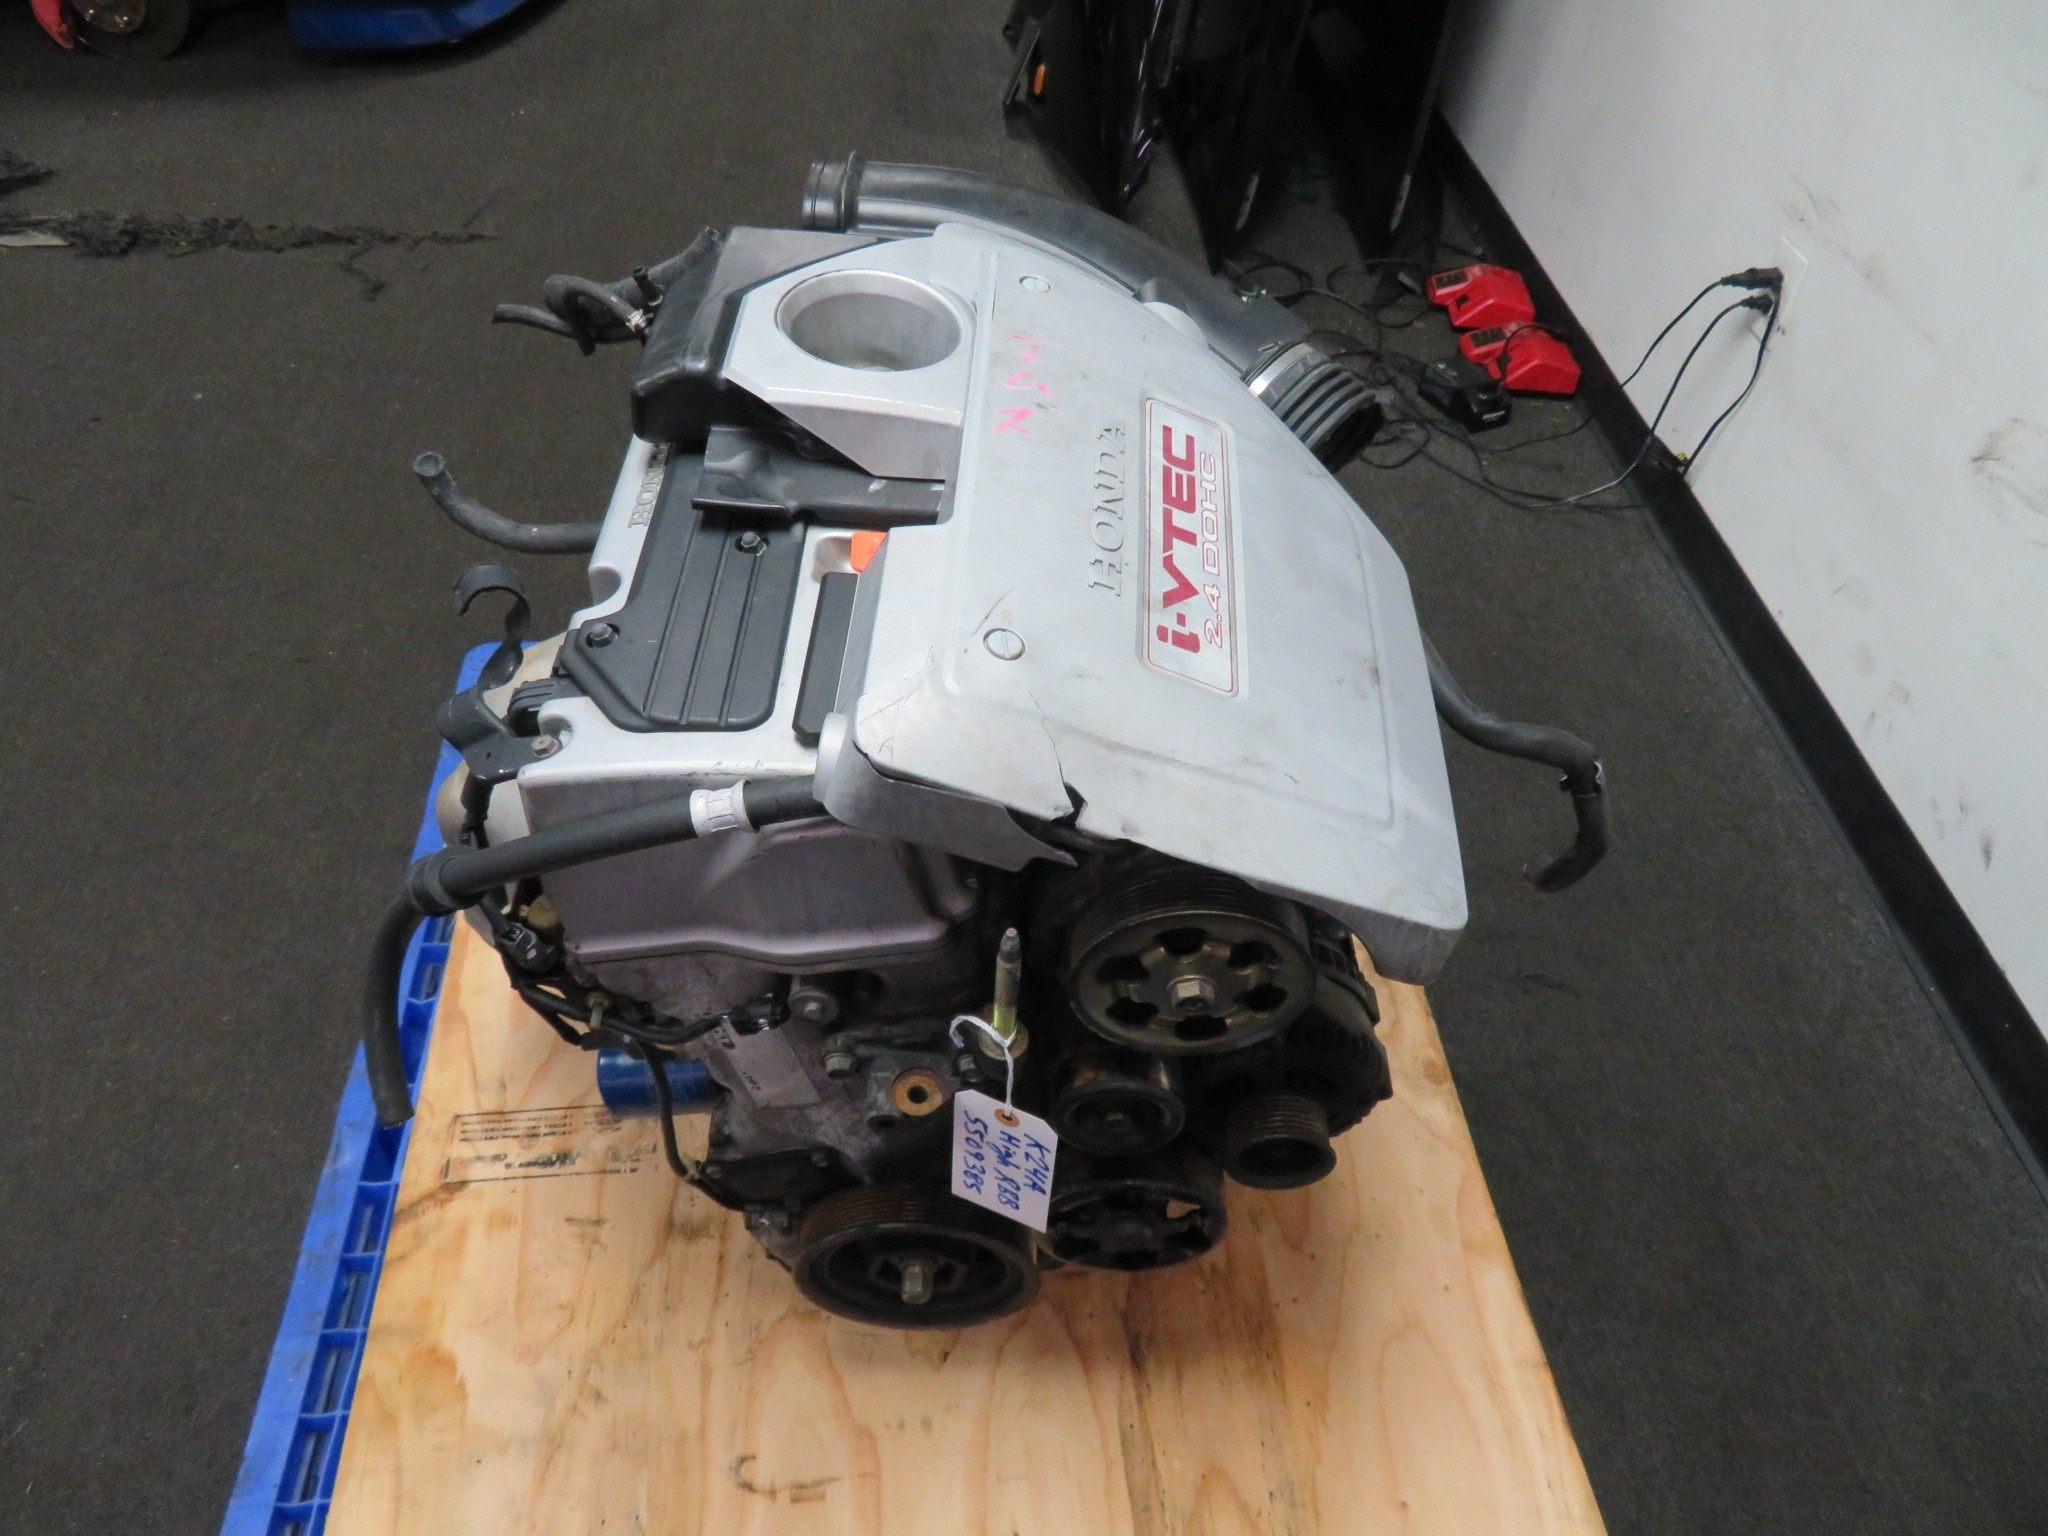 Jdm Honda Acura Tsx K24a 2 4l Ivtec Engine High Compression Rbb Head Jdm King Motors Corp